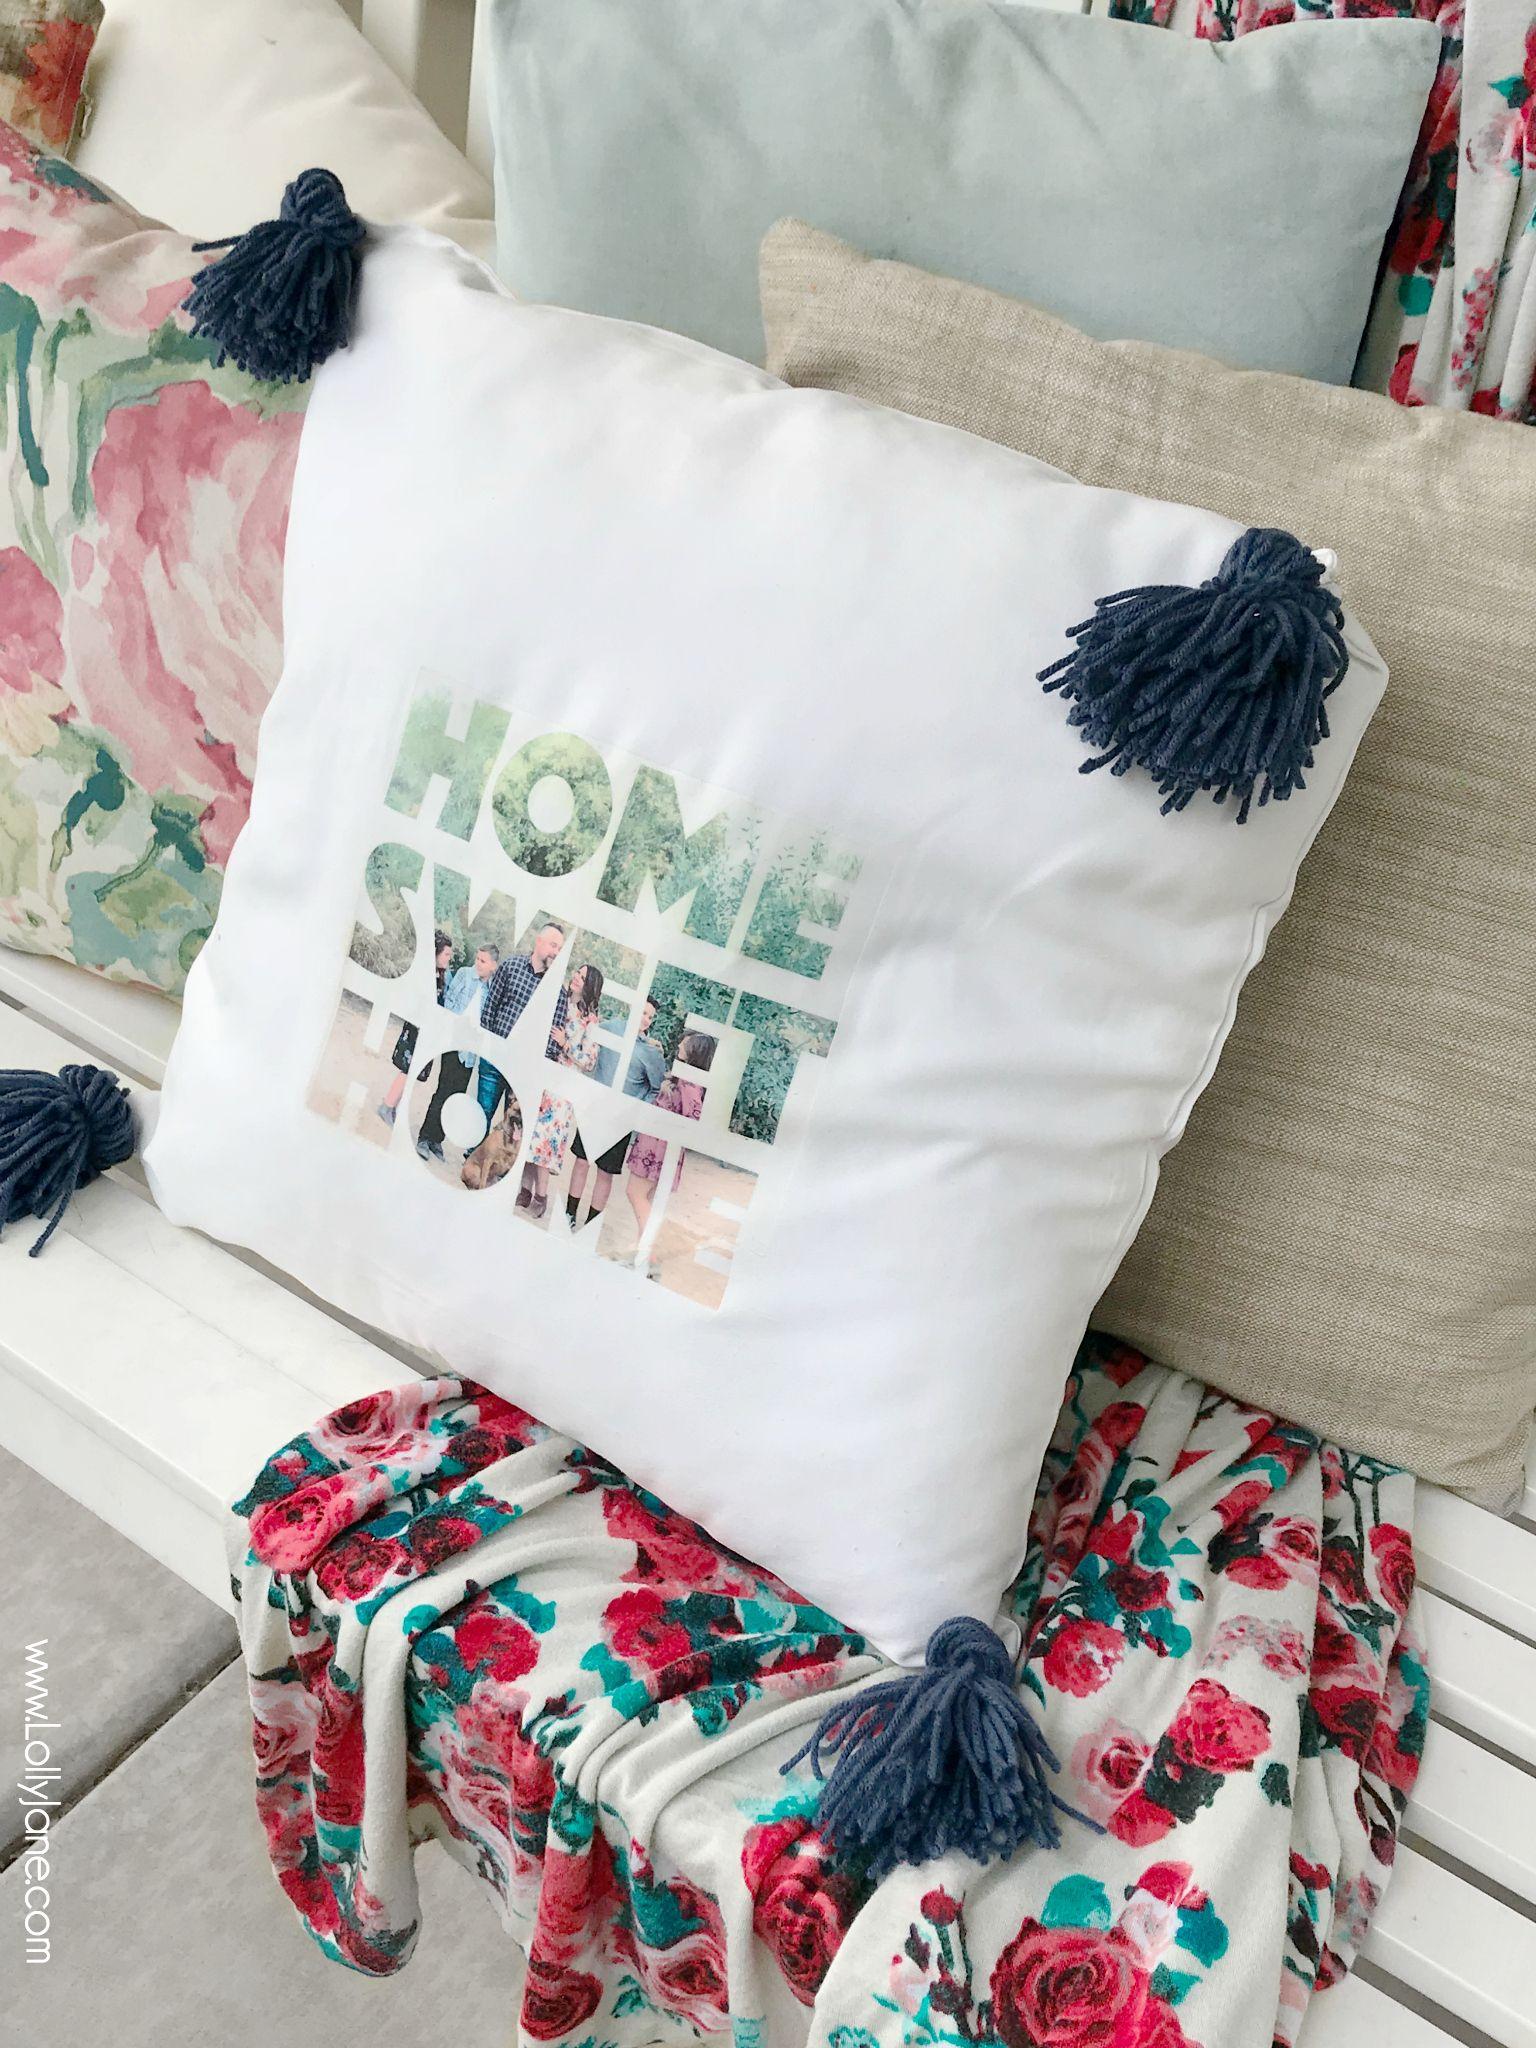 Diy photo text pillow in diy craft ideas pinterest texts